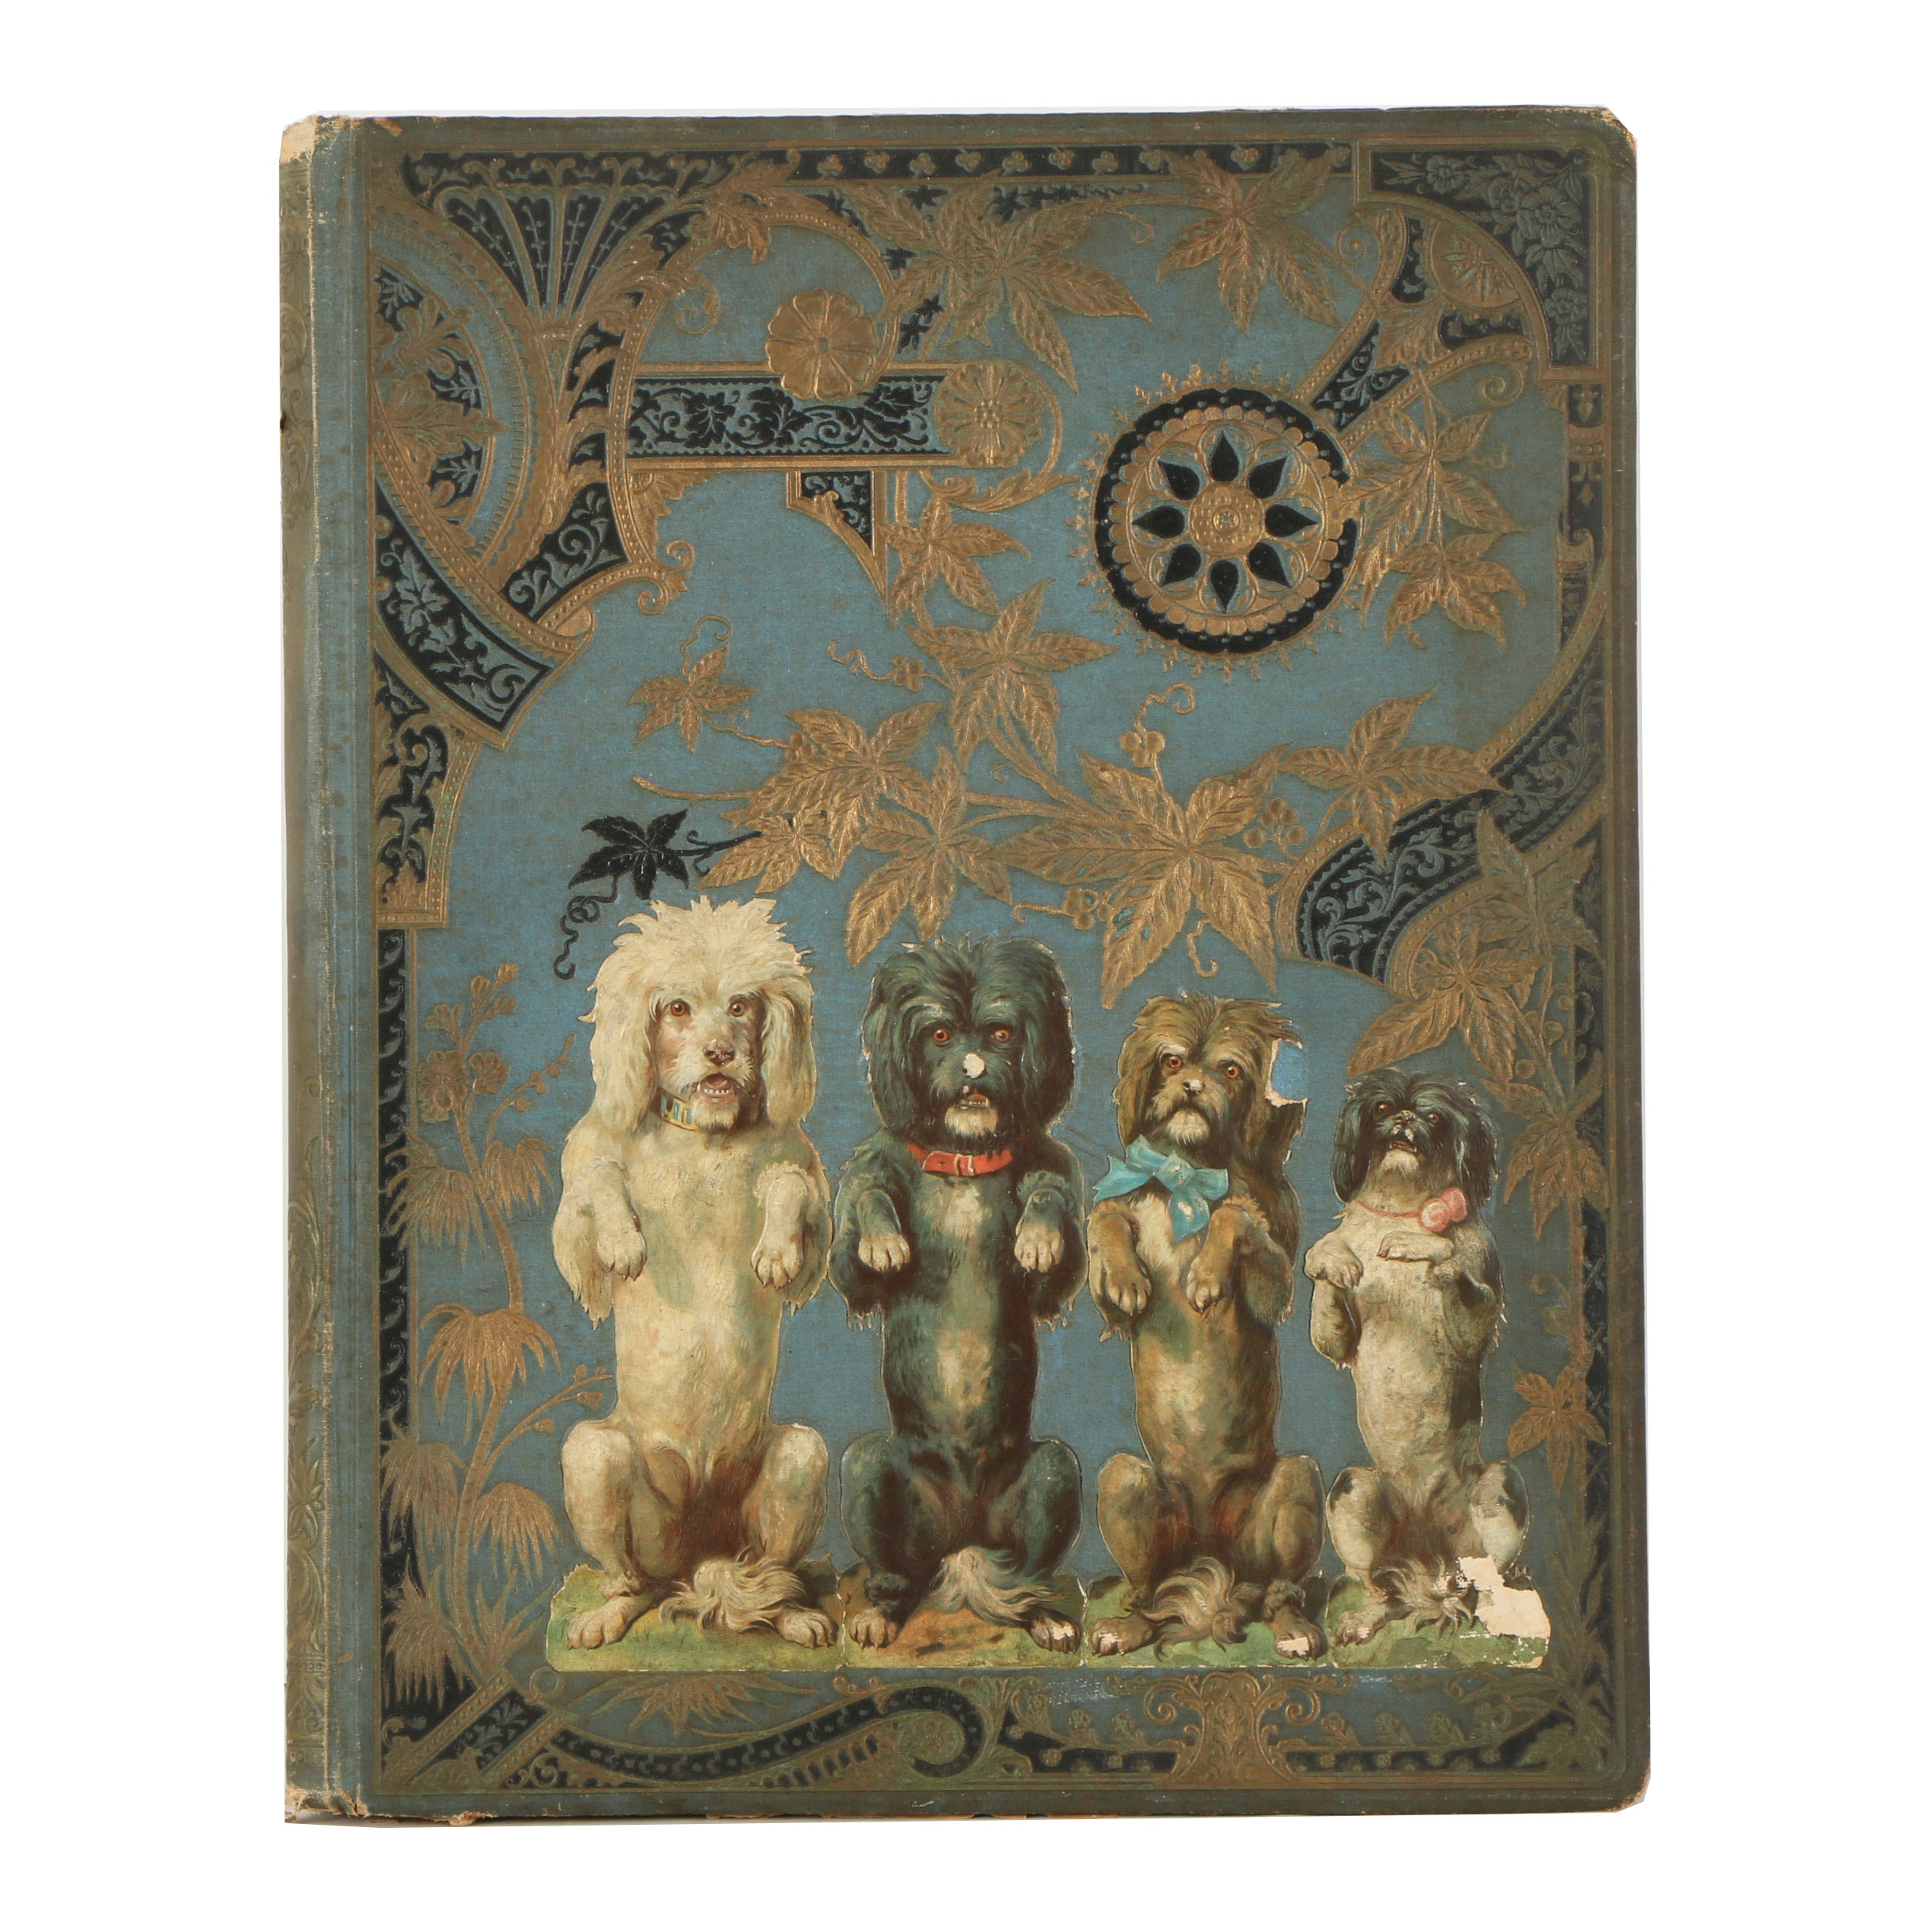 Scrapbook of Vintage Chromolithographs and Halftone Prints